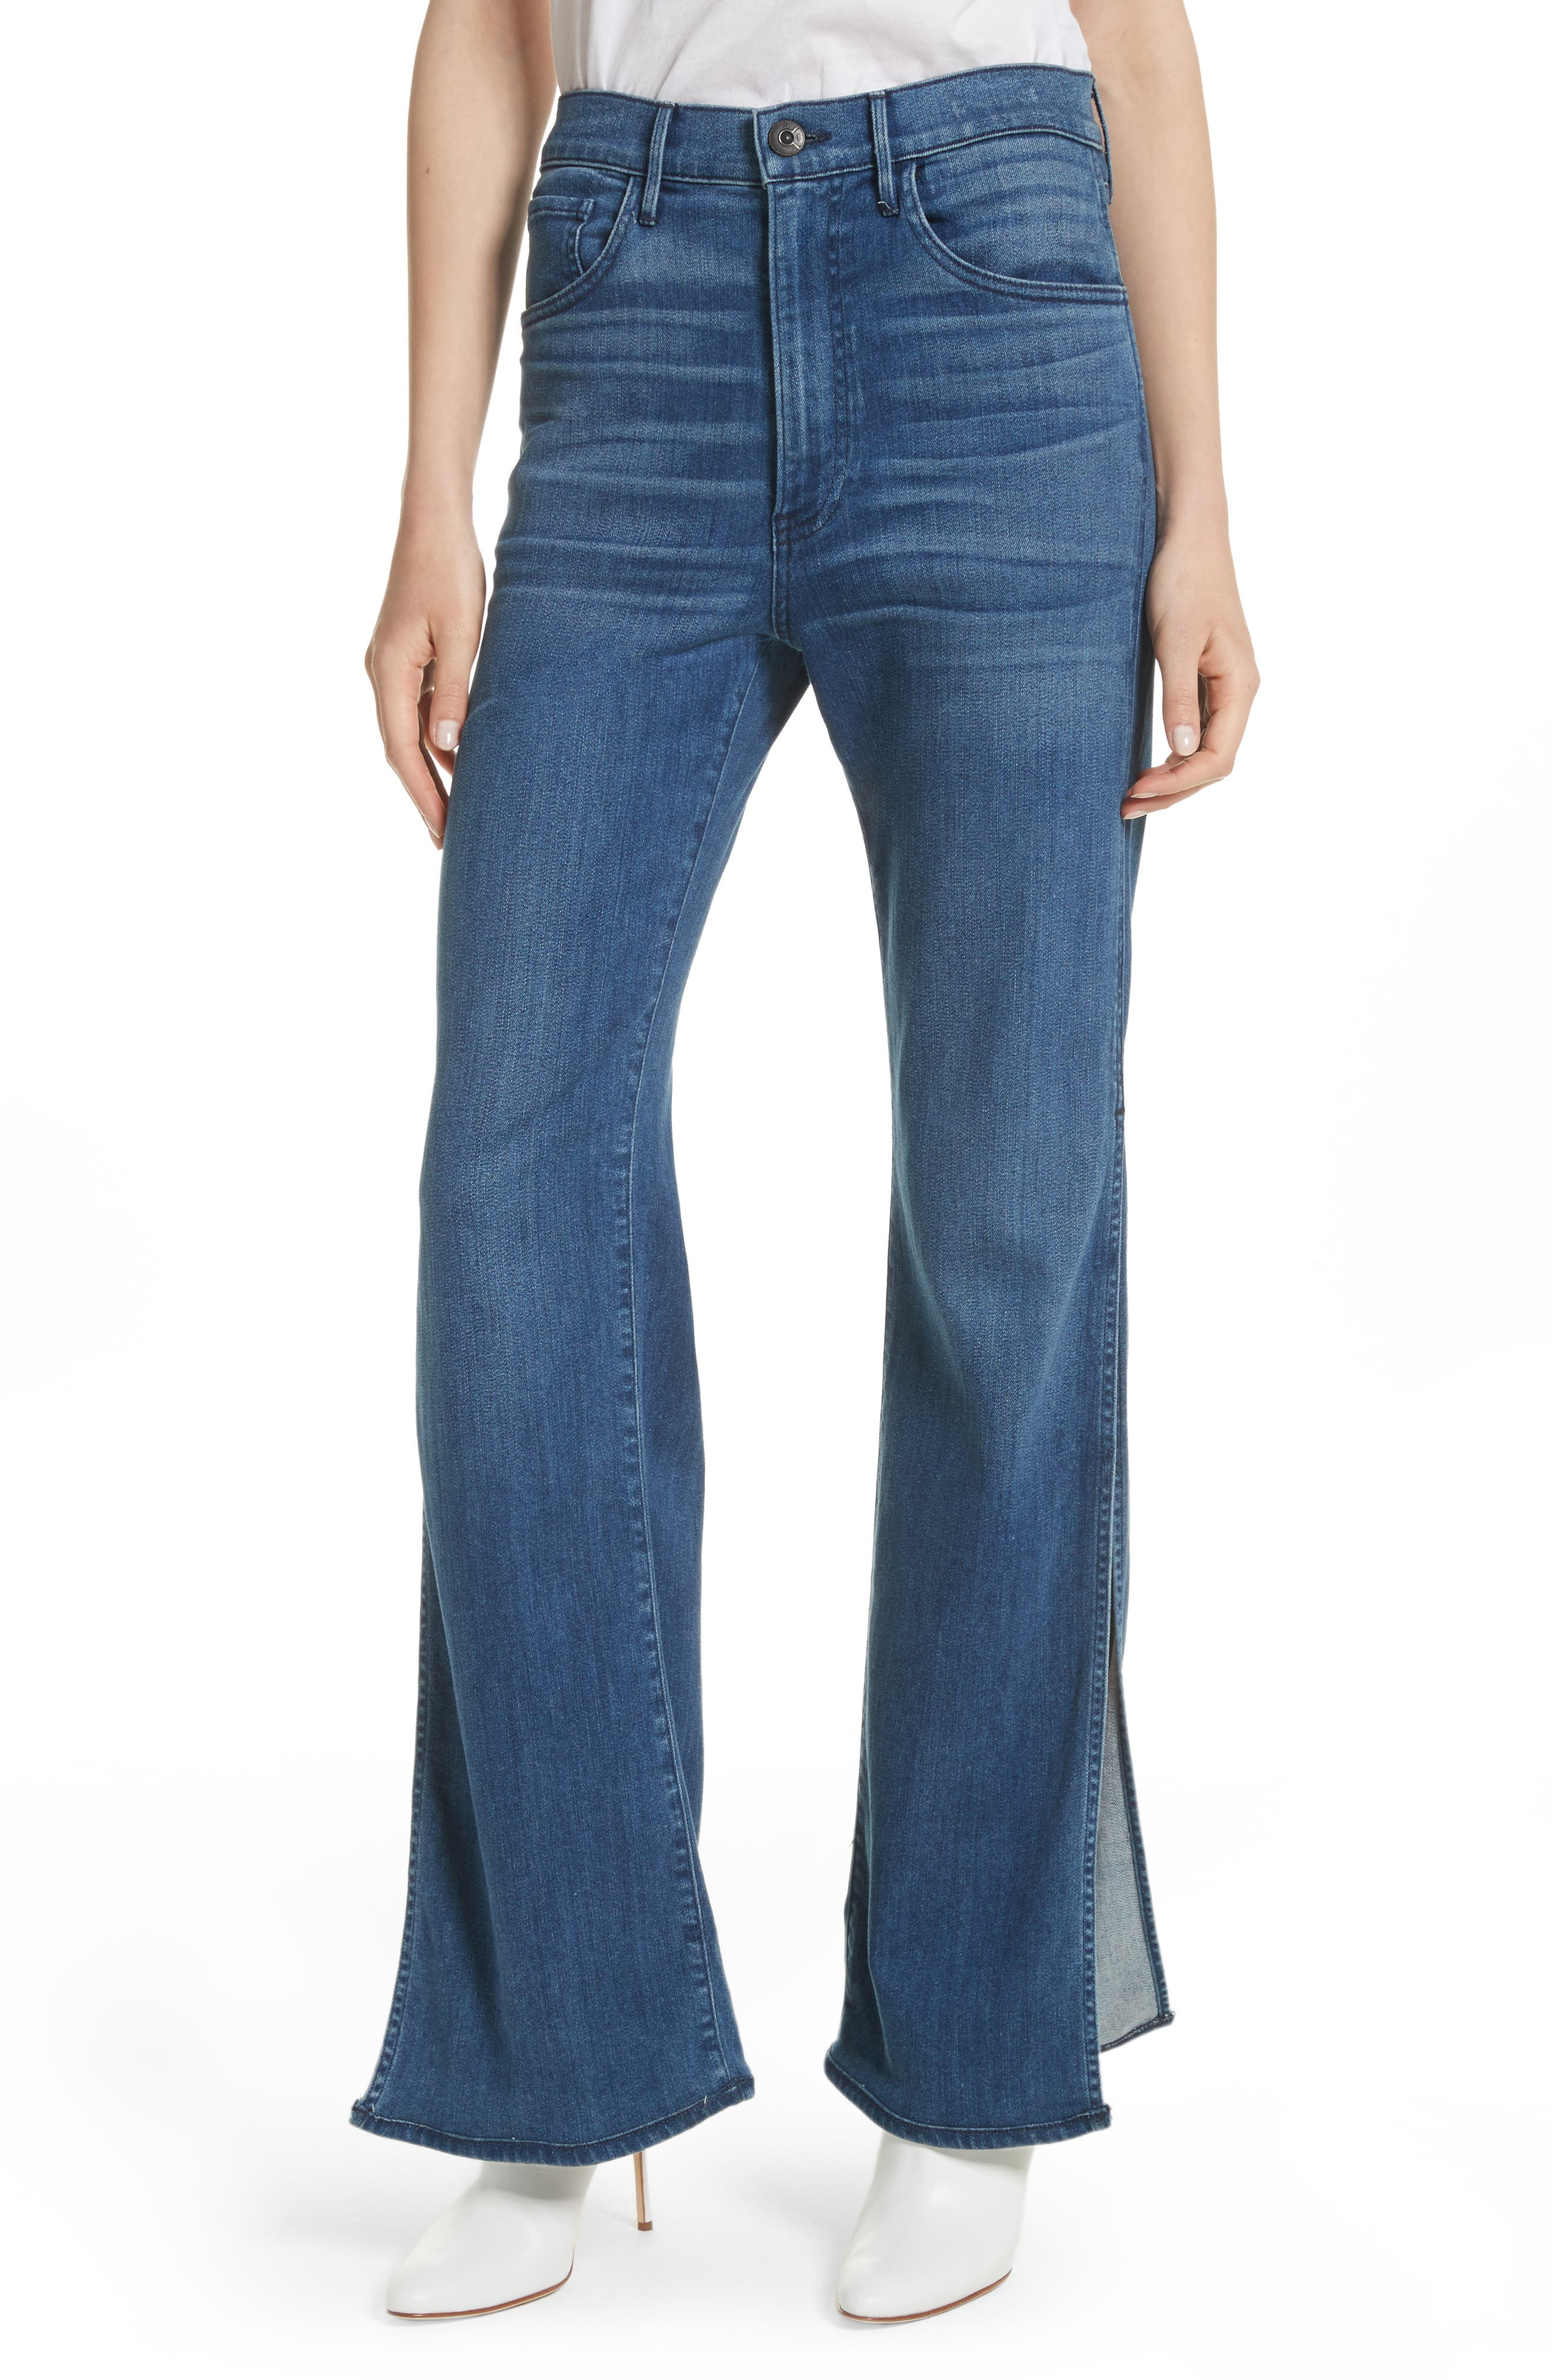 W4 Adeline High Waist Split Flare Jeans,                             Main thumbnail 1, color,                             426